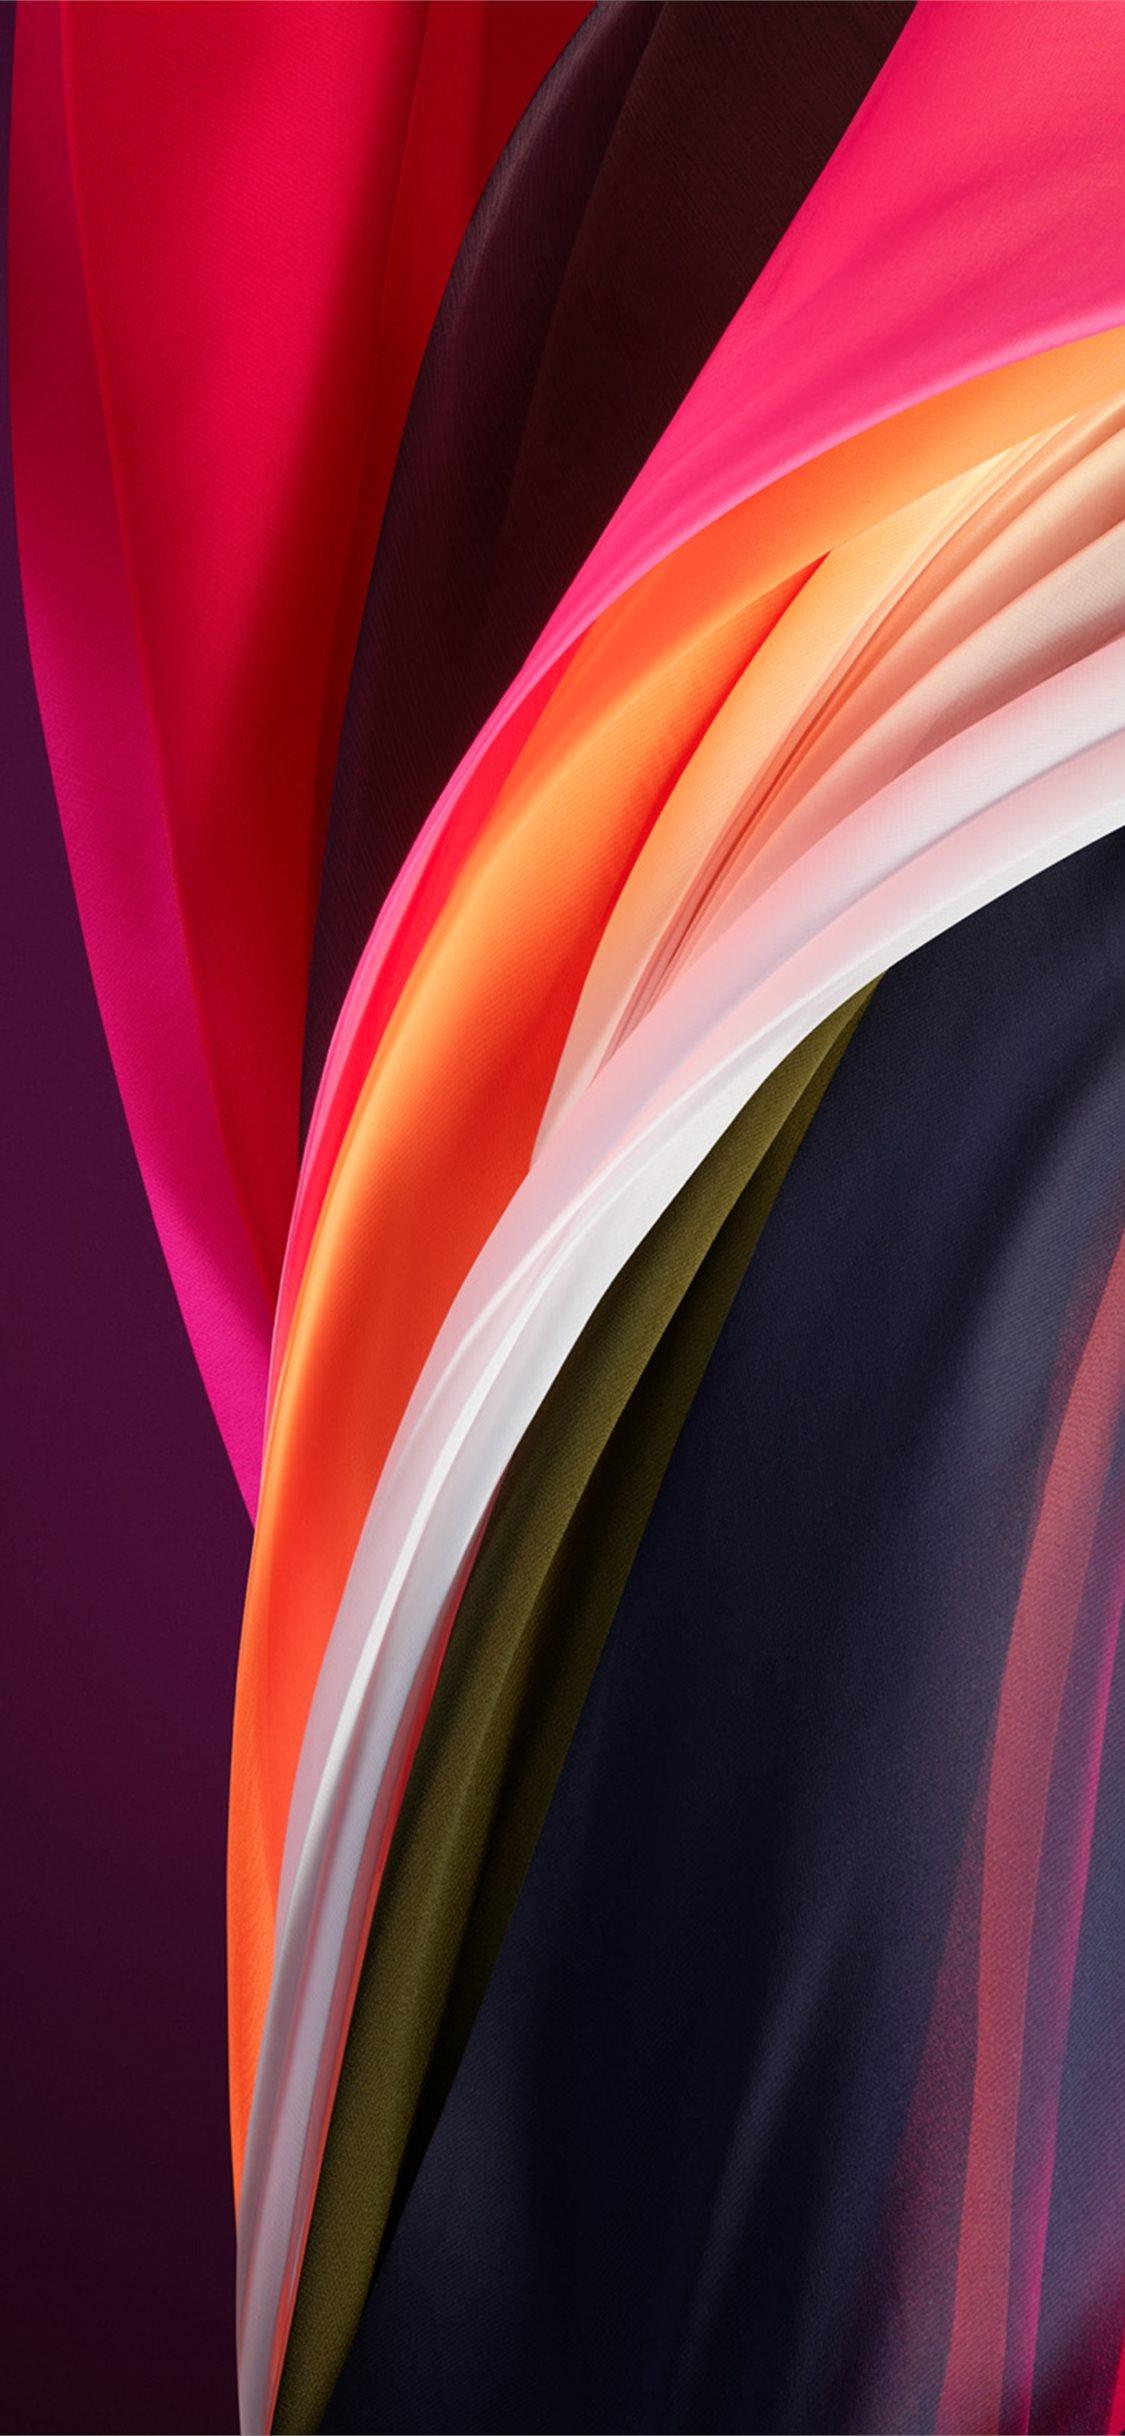 iphone se 2020 stock wallpaper Silk Purple Light iphone x wallpaper ilikewallpaper com